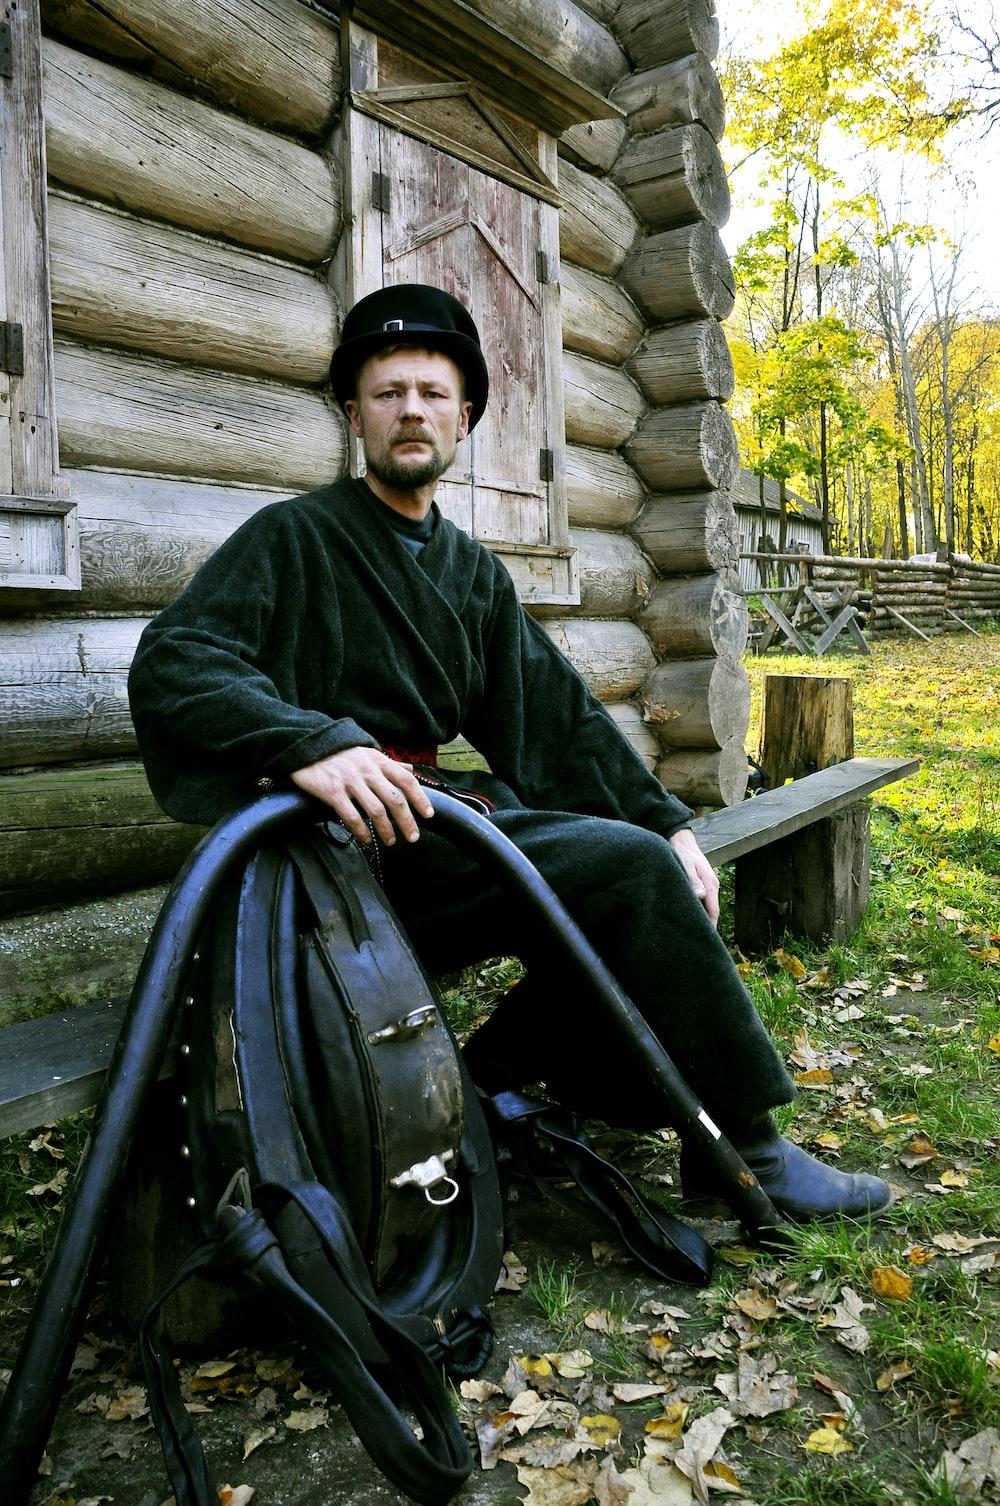 man in black jacket sitting on black wheel chair